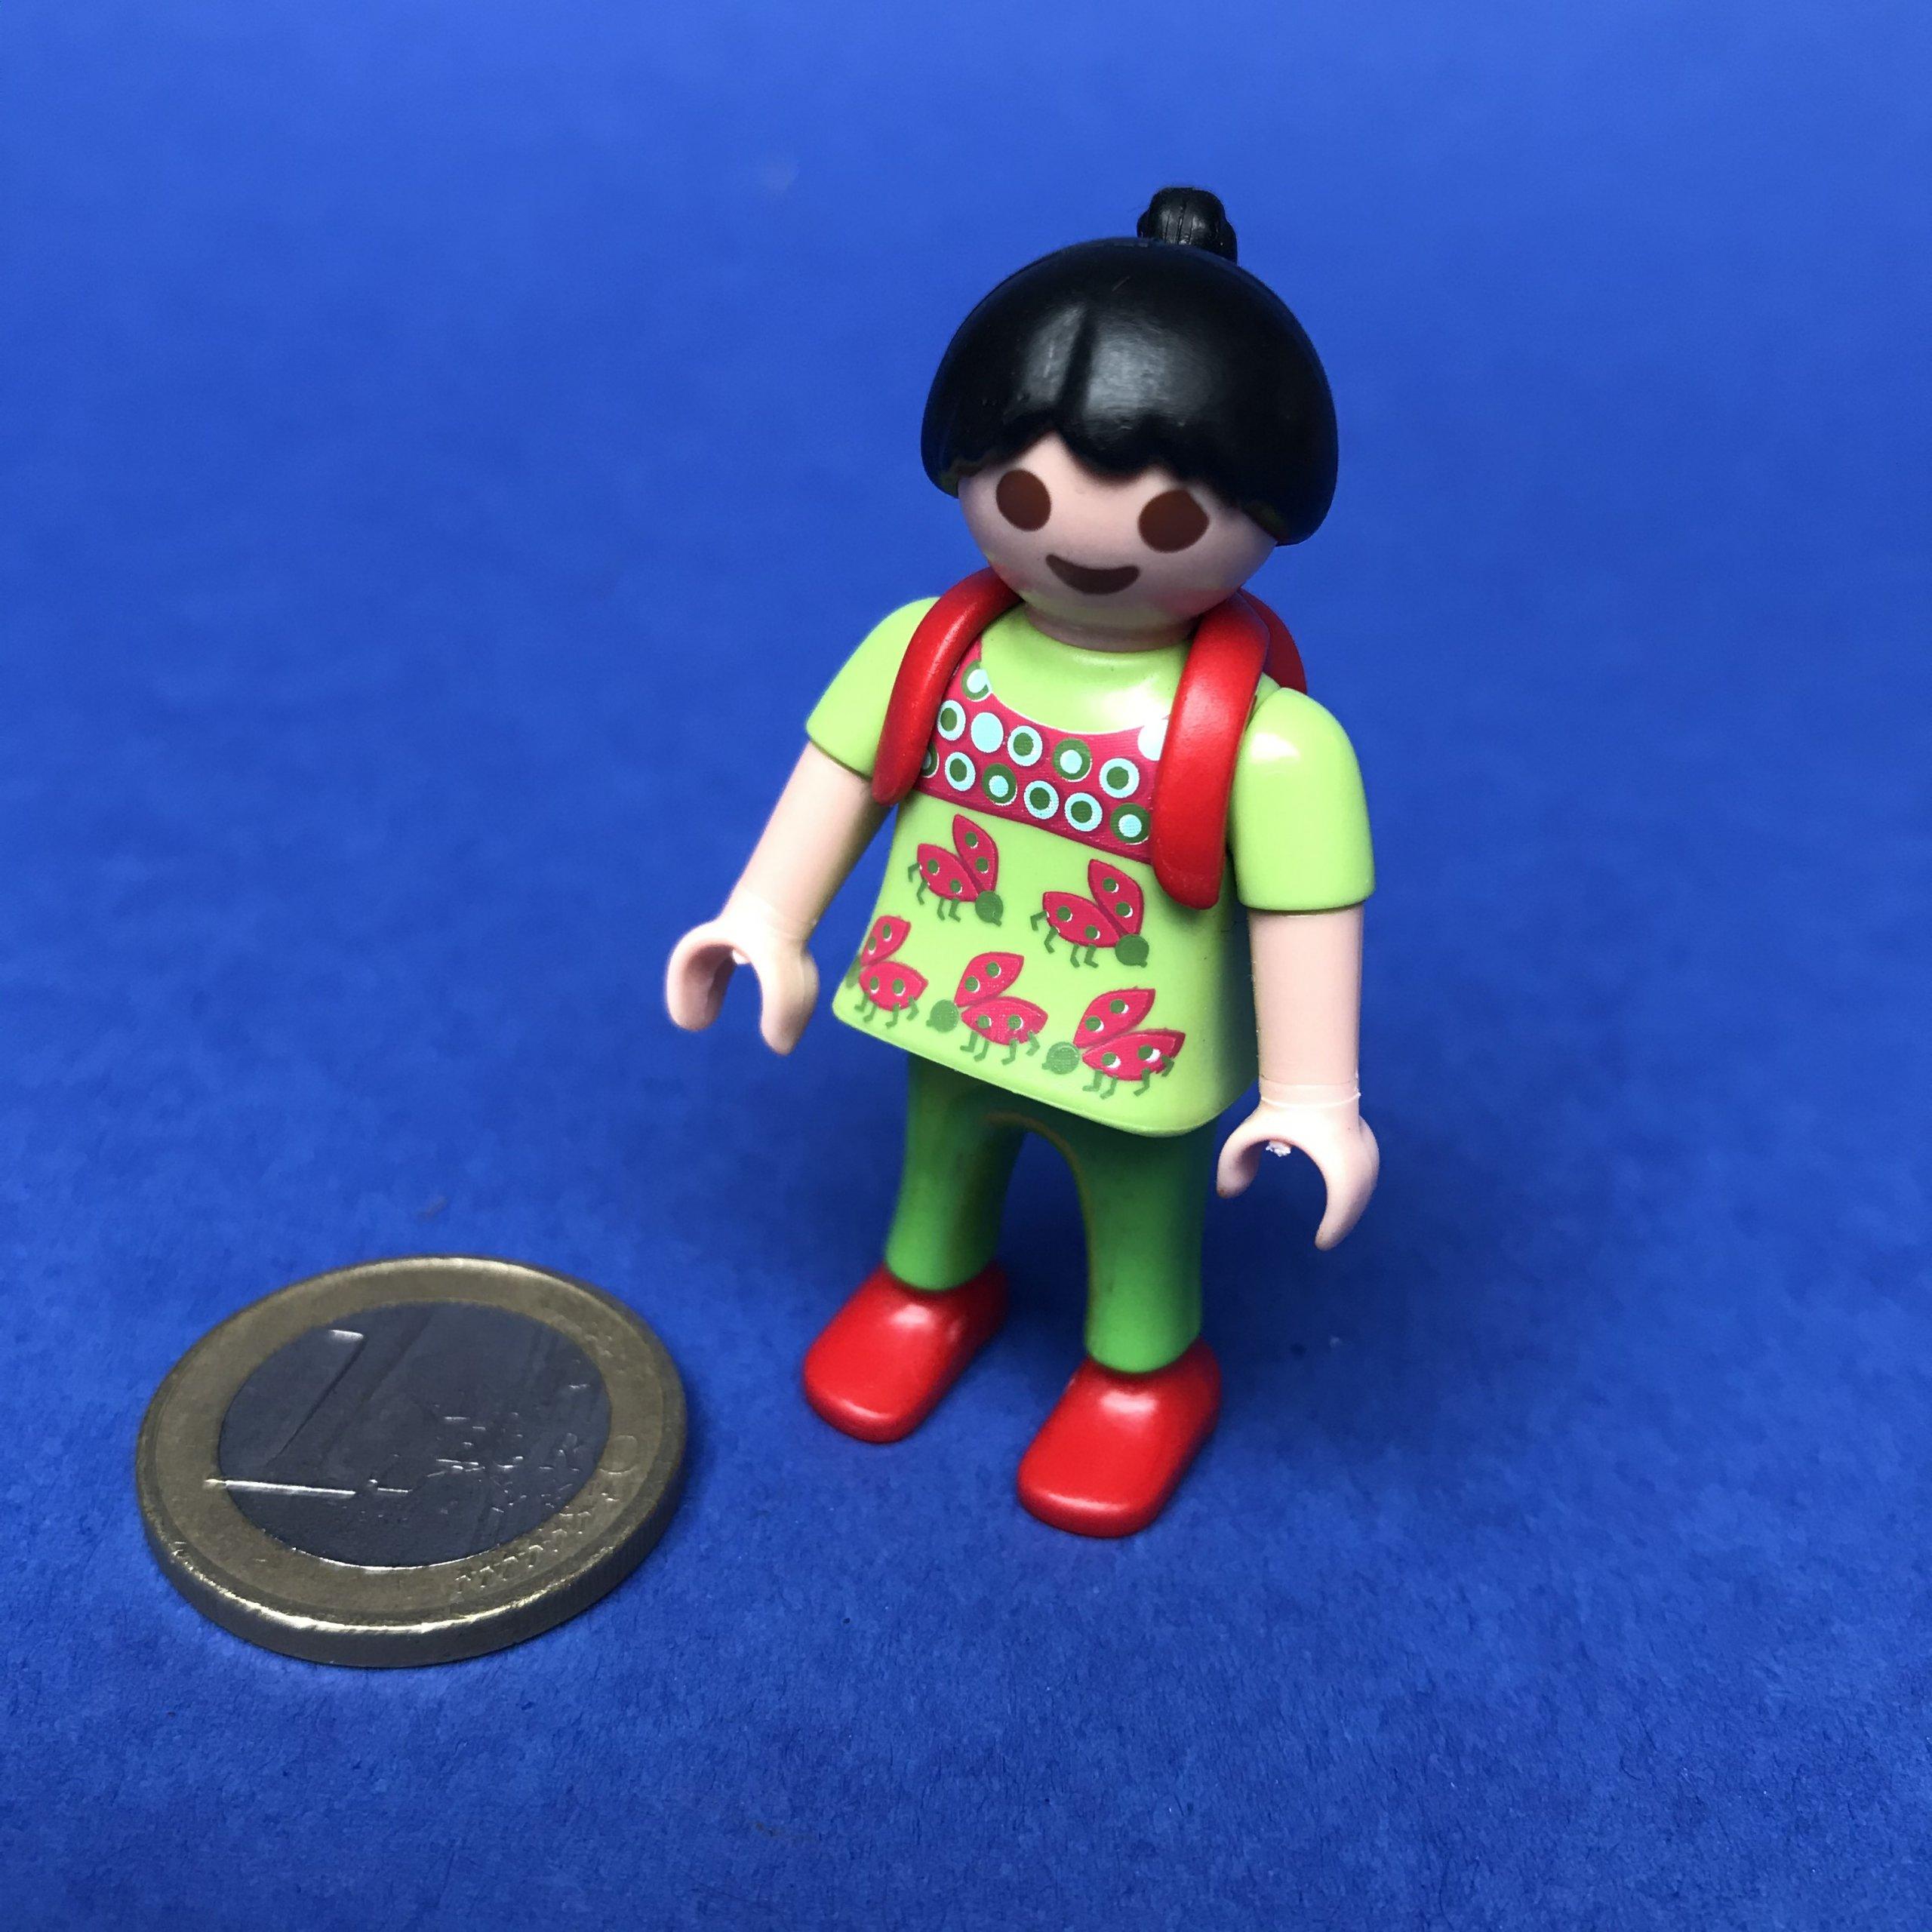 Playmobil-meisje-rugzak